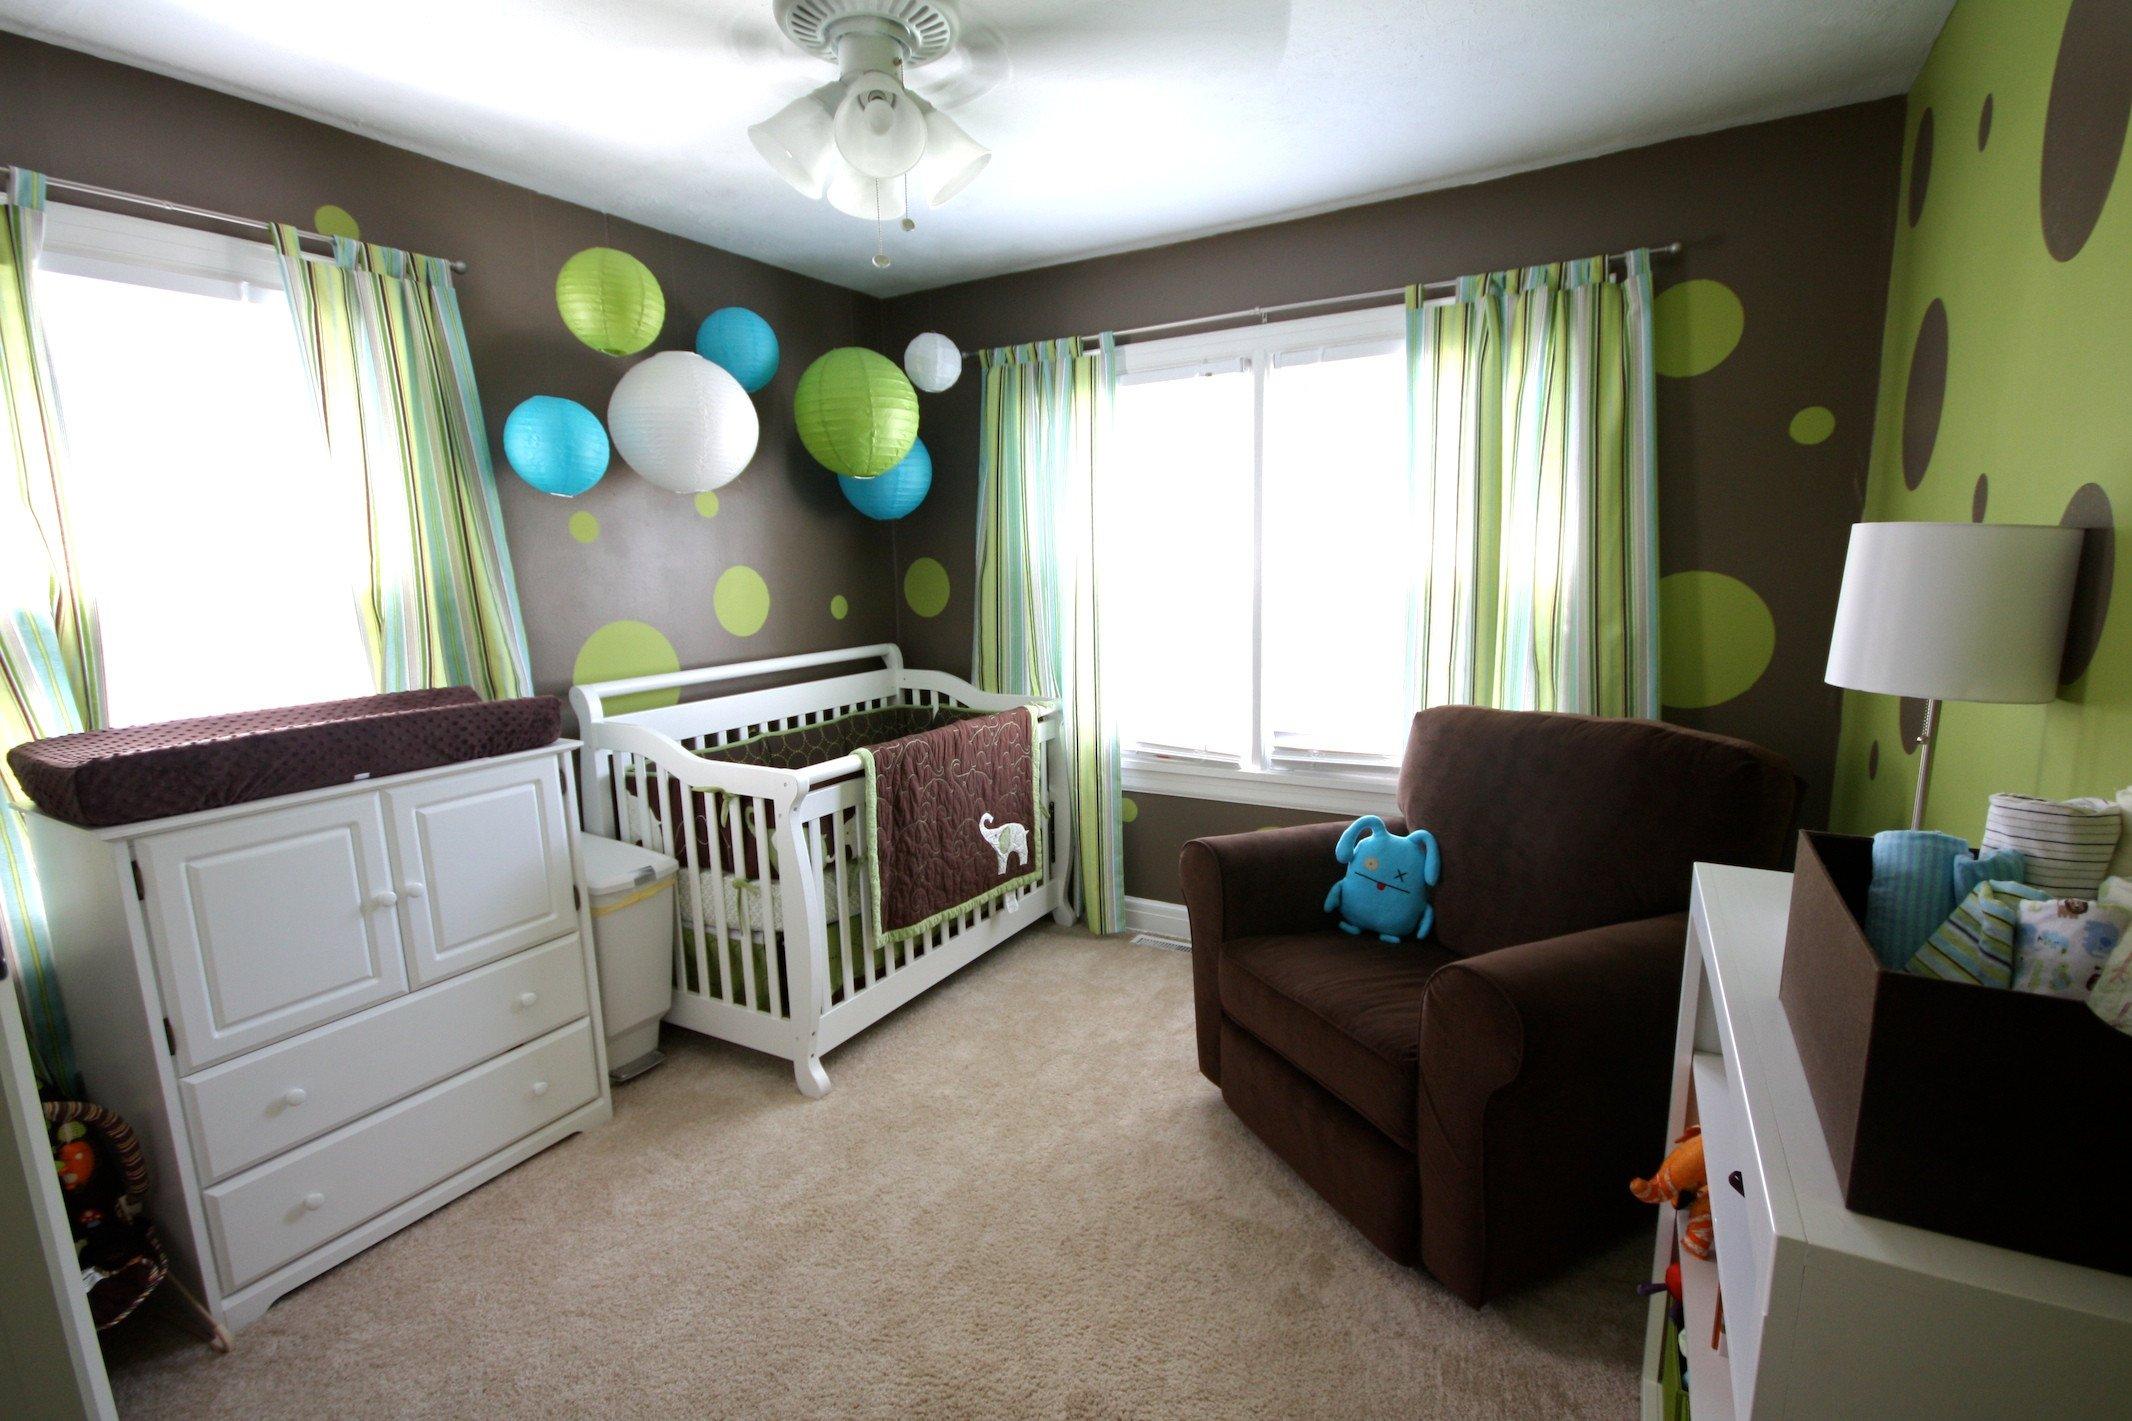 Decor Ideas for Boys Room Elegant Boys Room Designs Ideas & Inspiration